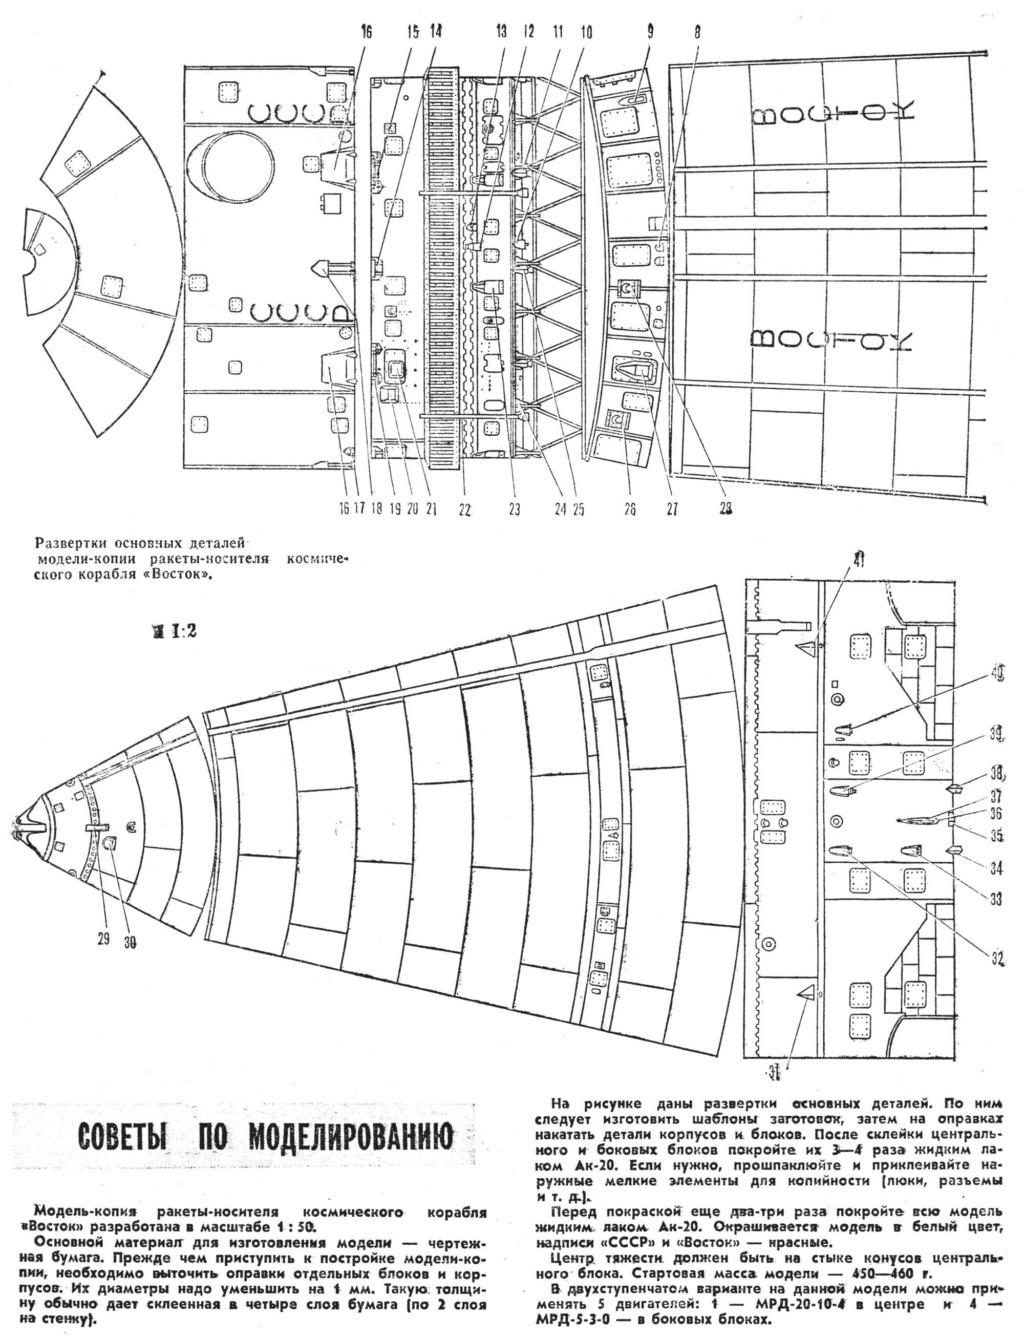 Vostok R7 Vostok17